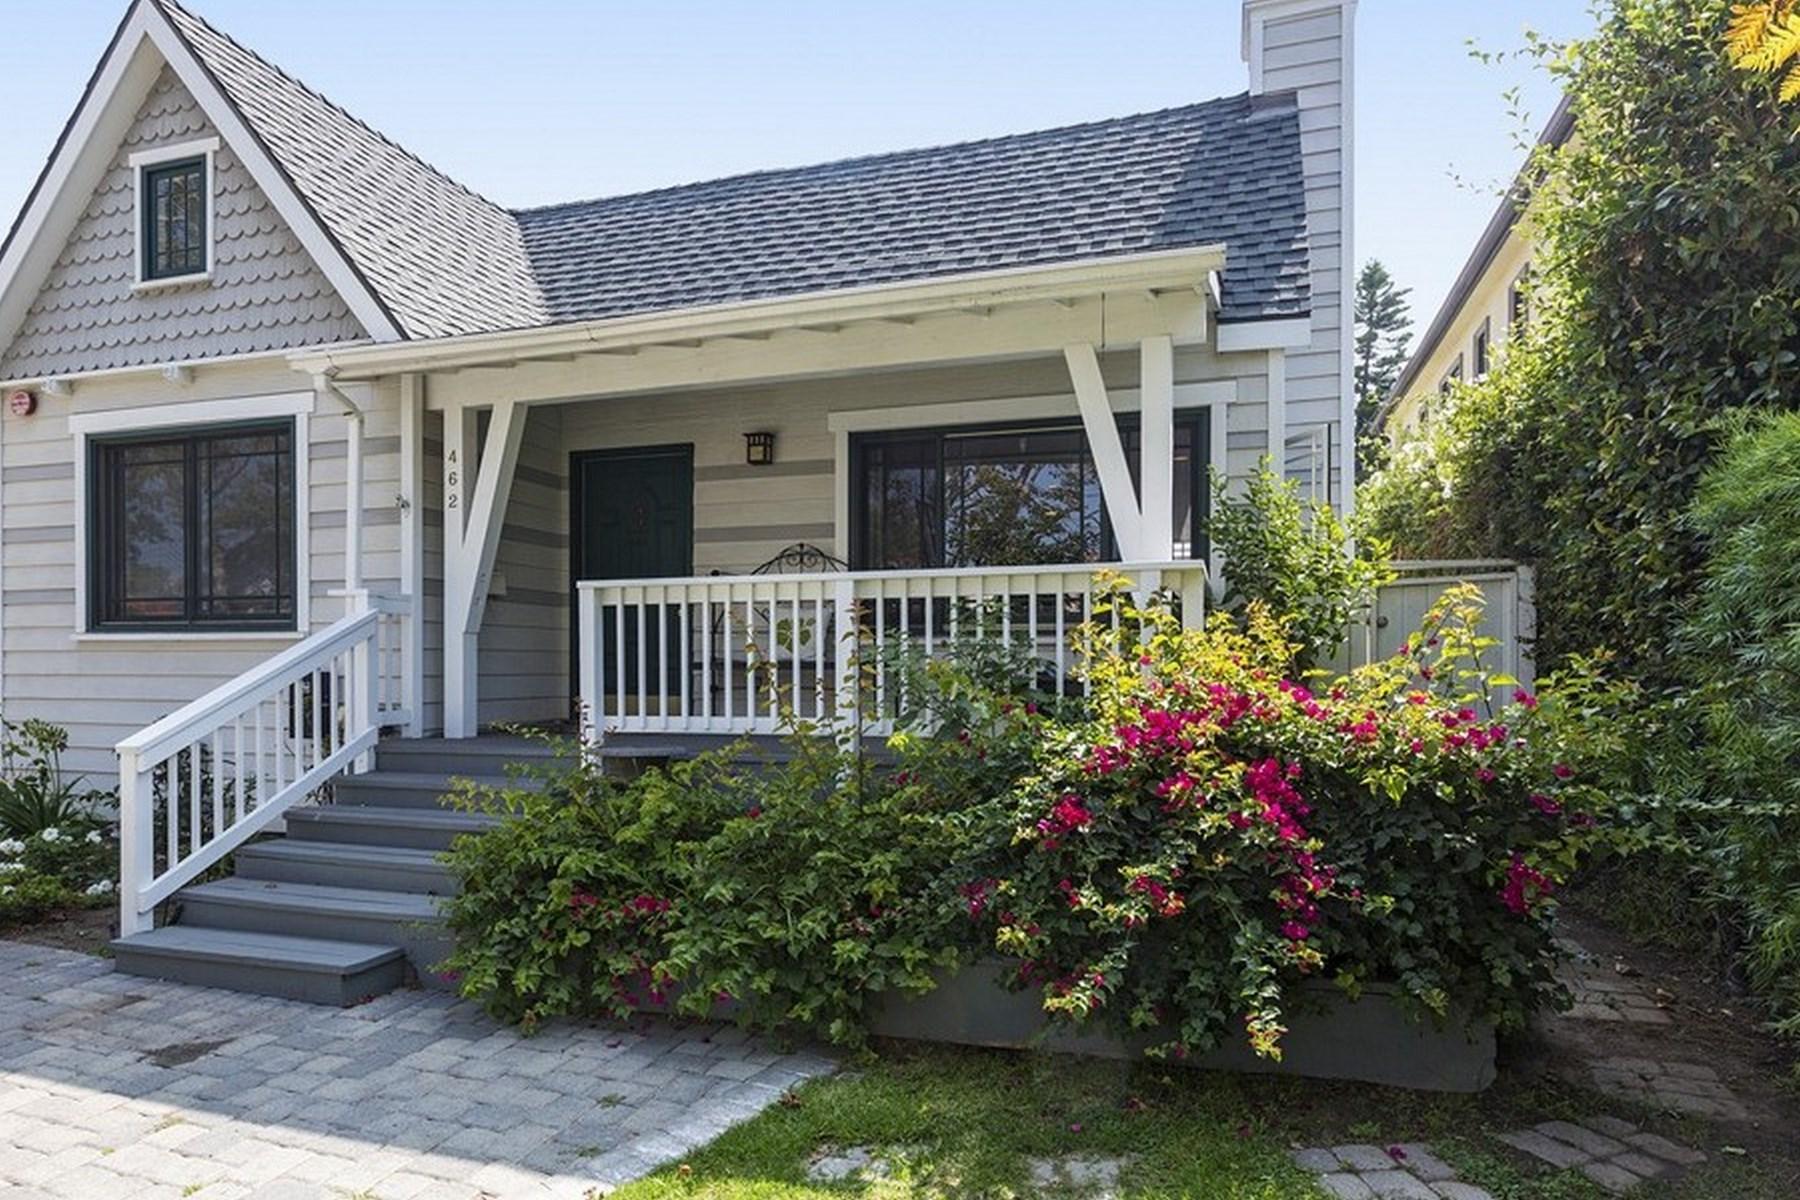 open-houses property at 462 S La Peer Drive